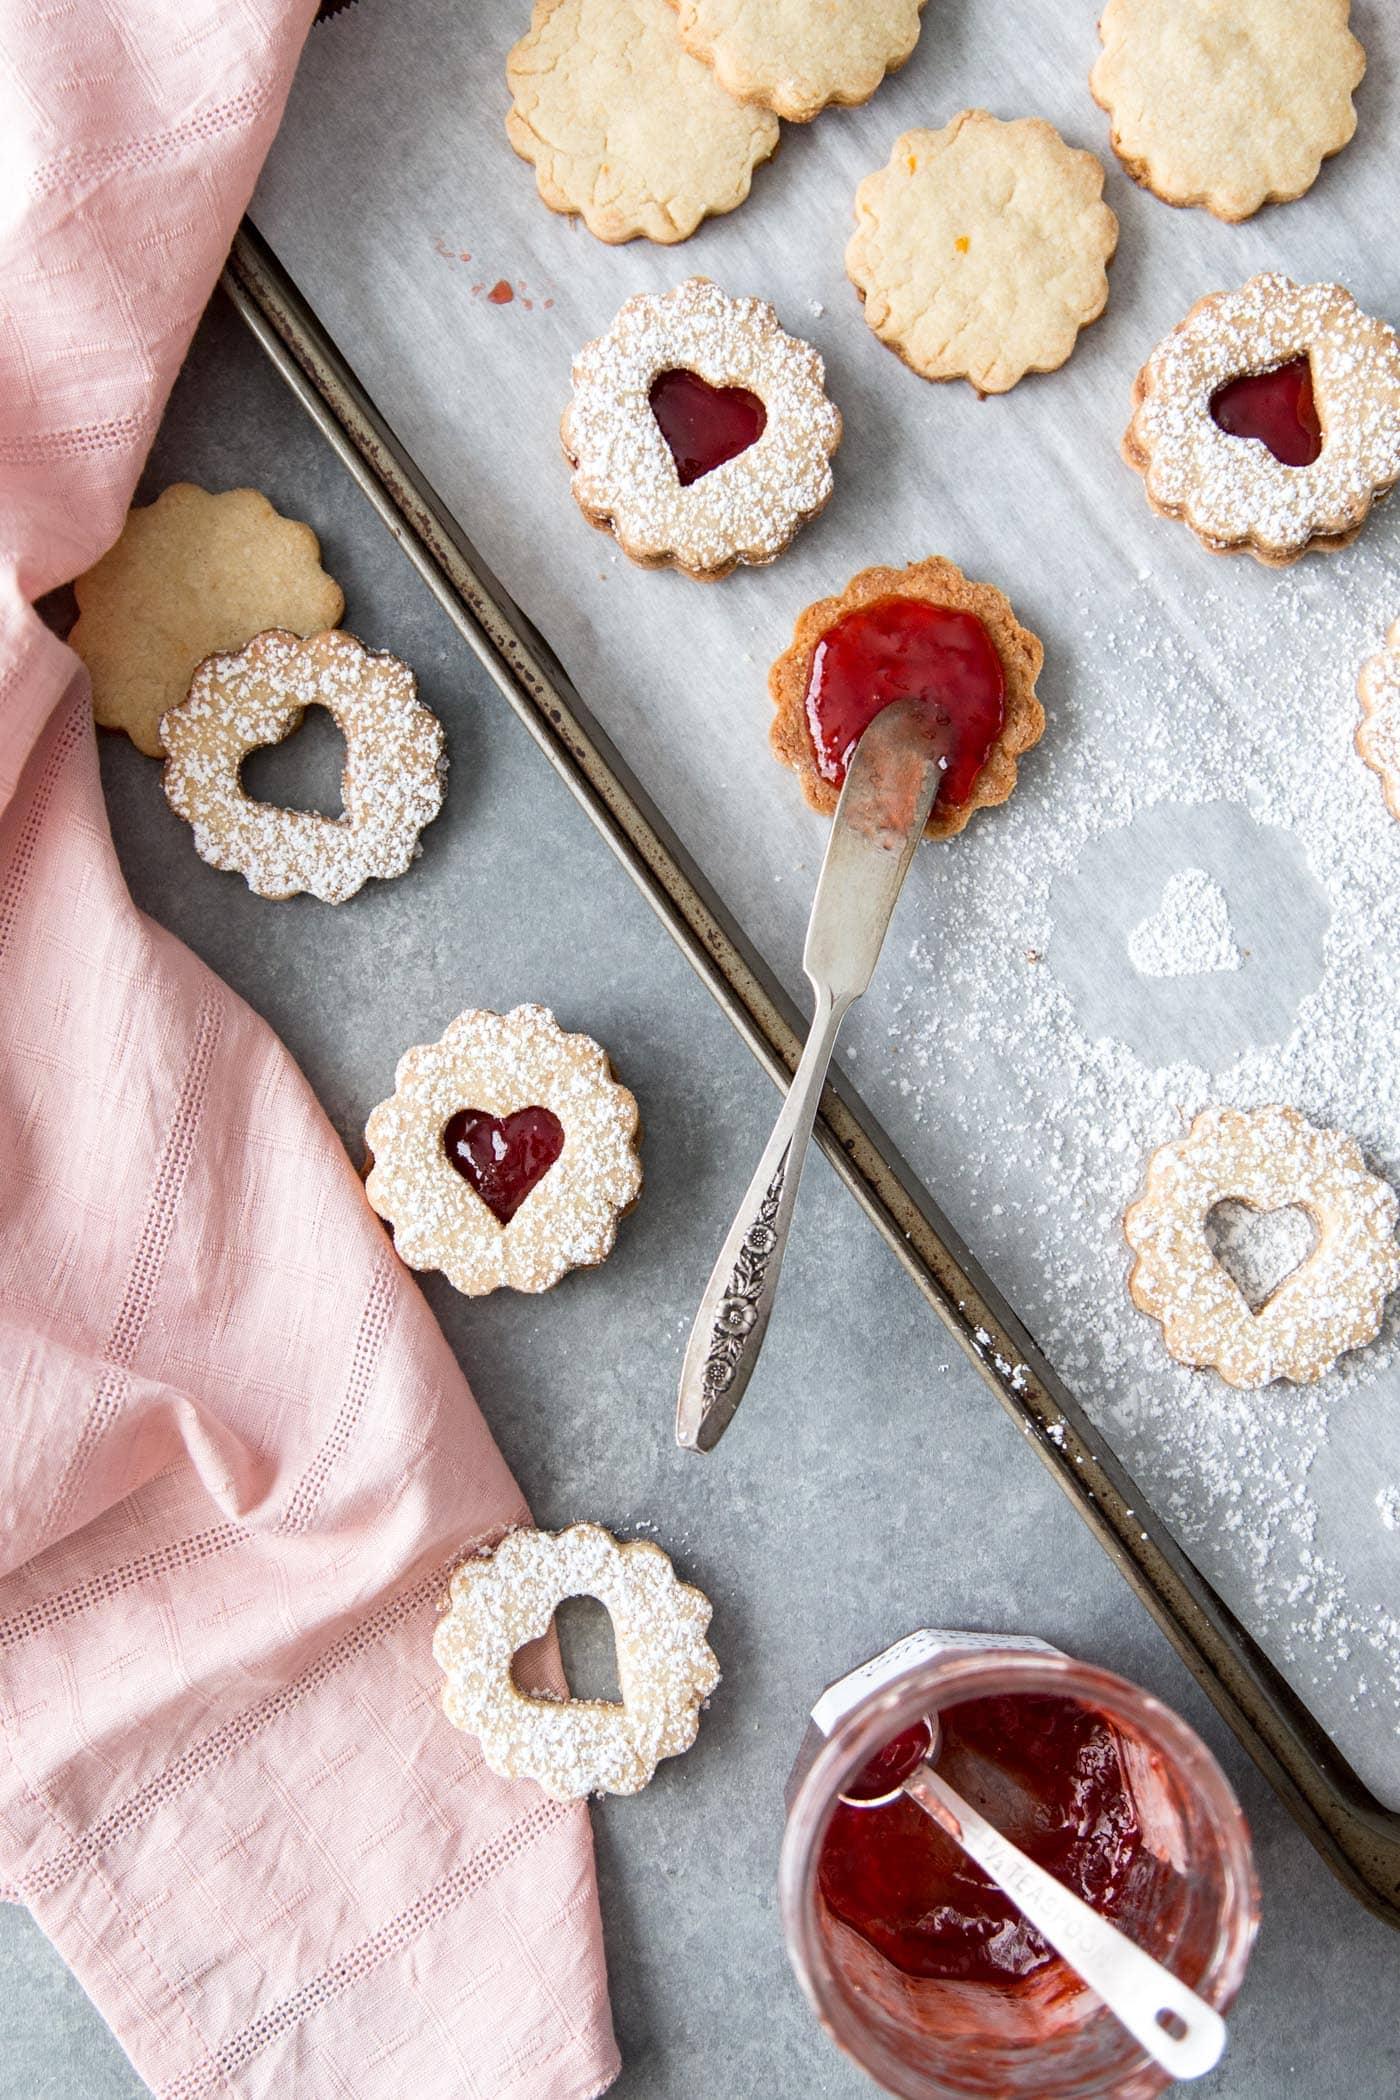 Adding strawberry jam to Linzer cookies